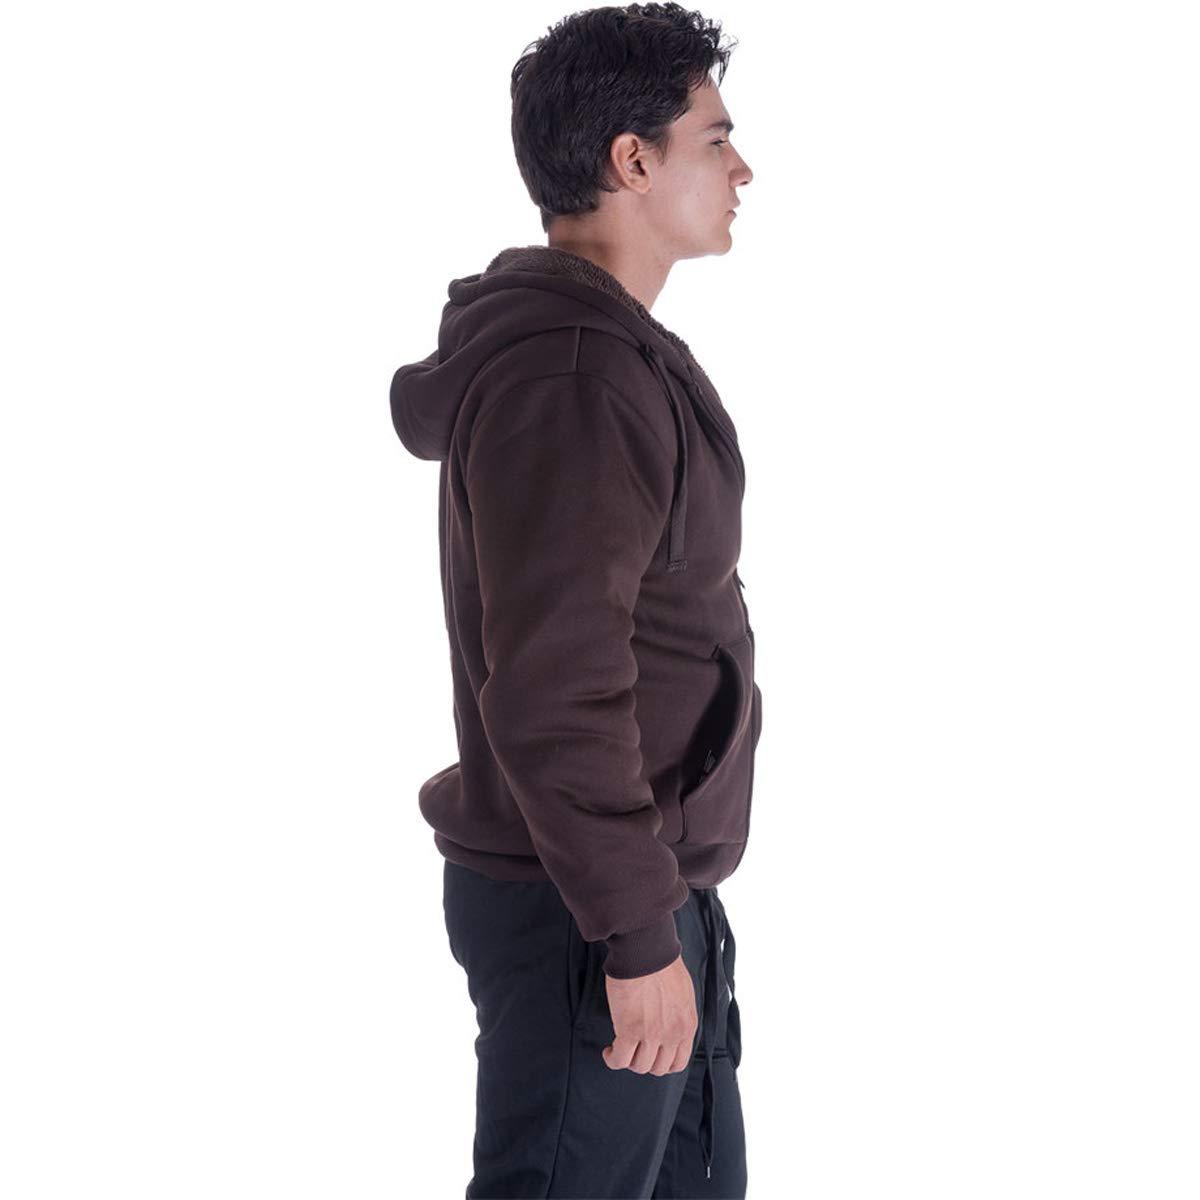 Leehanton Mens Zip Up Hoodie Sherpa-Lined Heavyweight Winter Sweatshirt Jackets